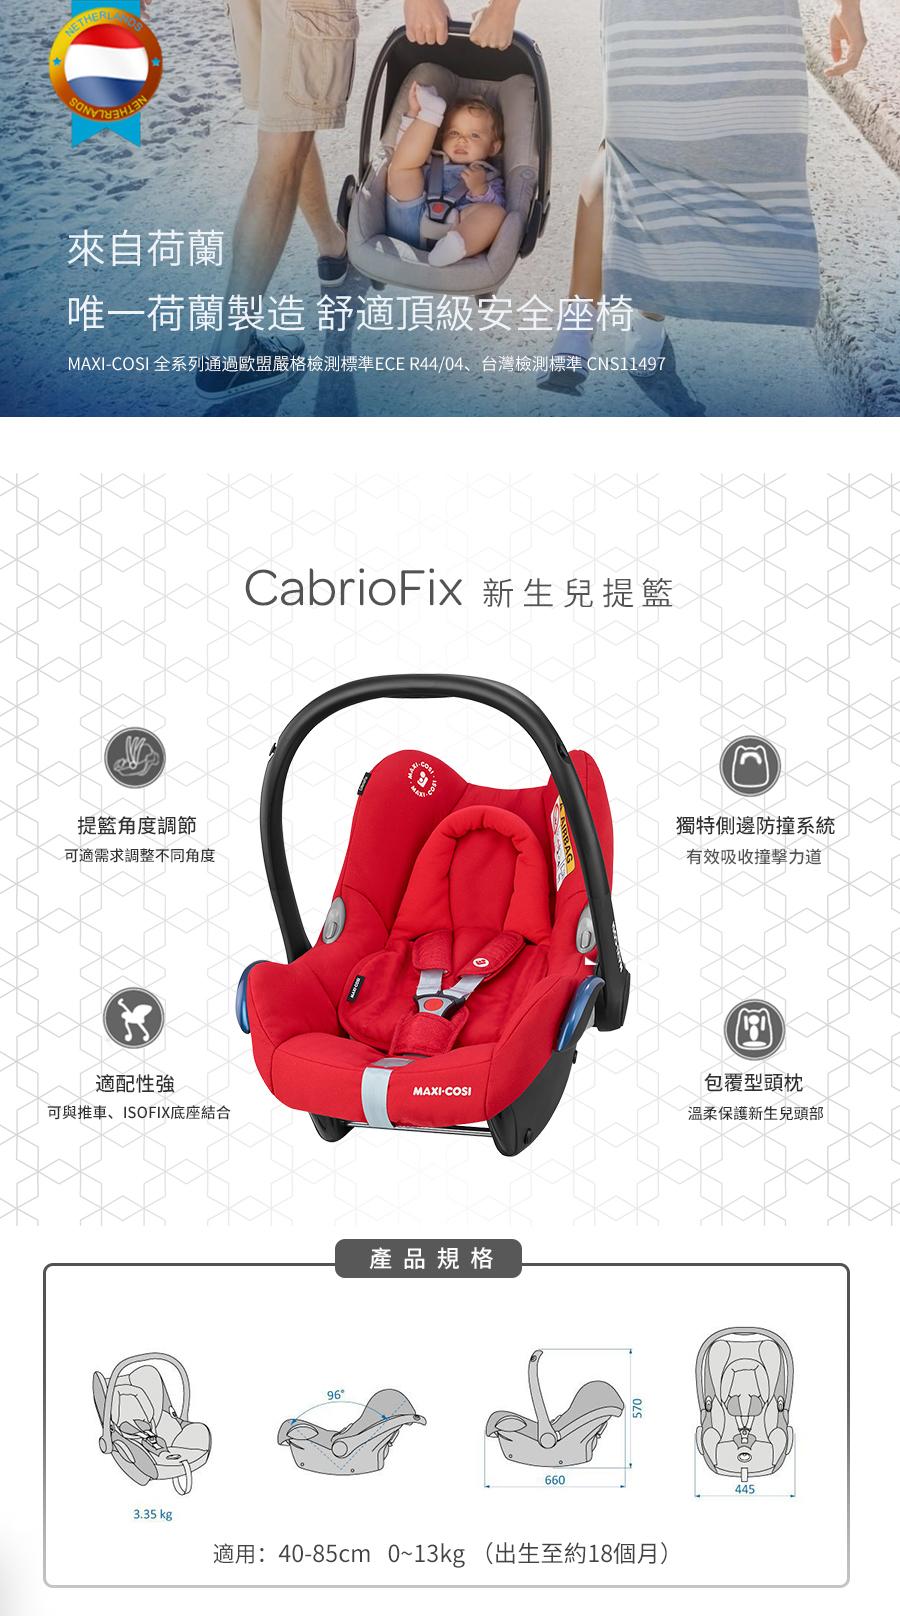 maxi-coxi-cabriofix-info01